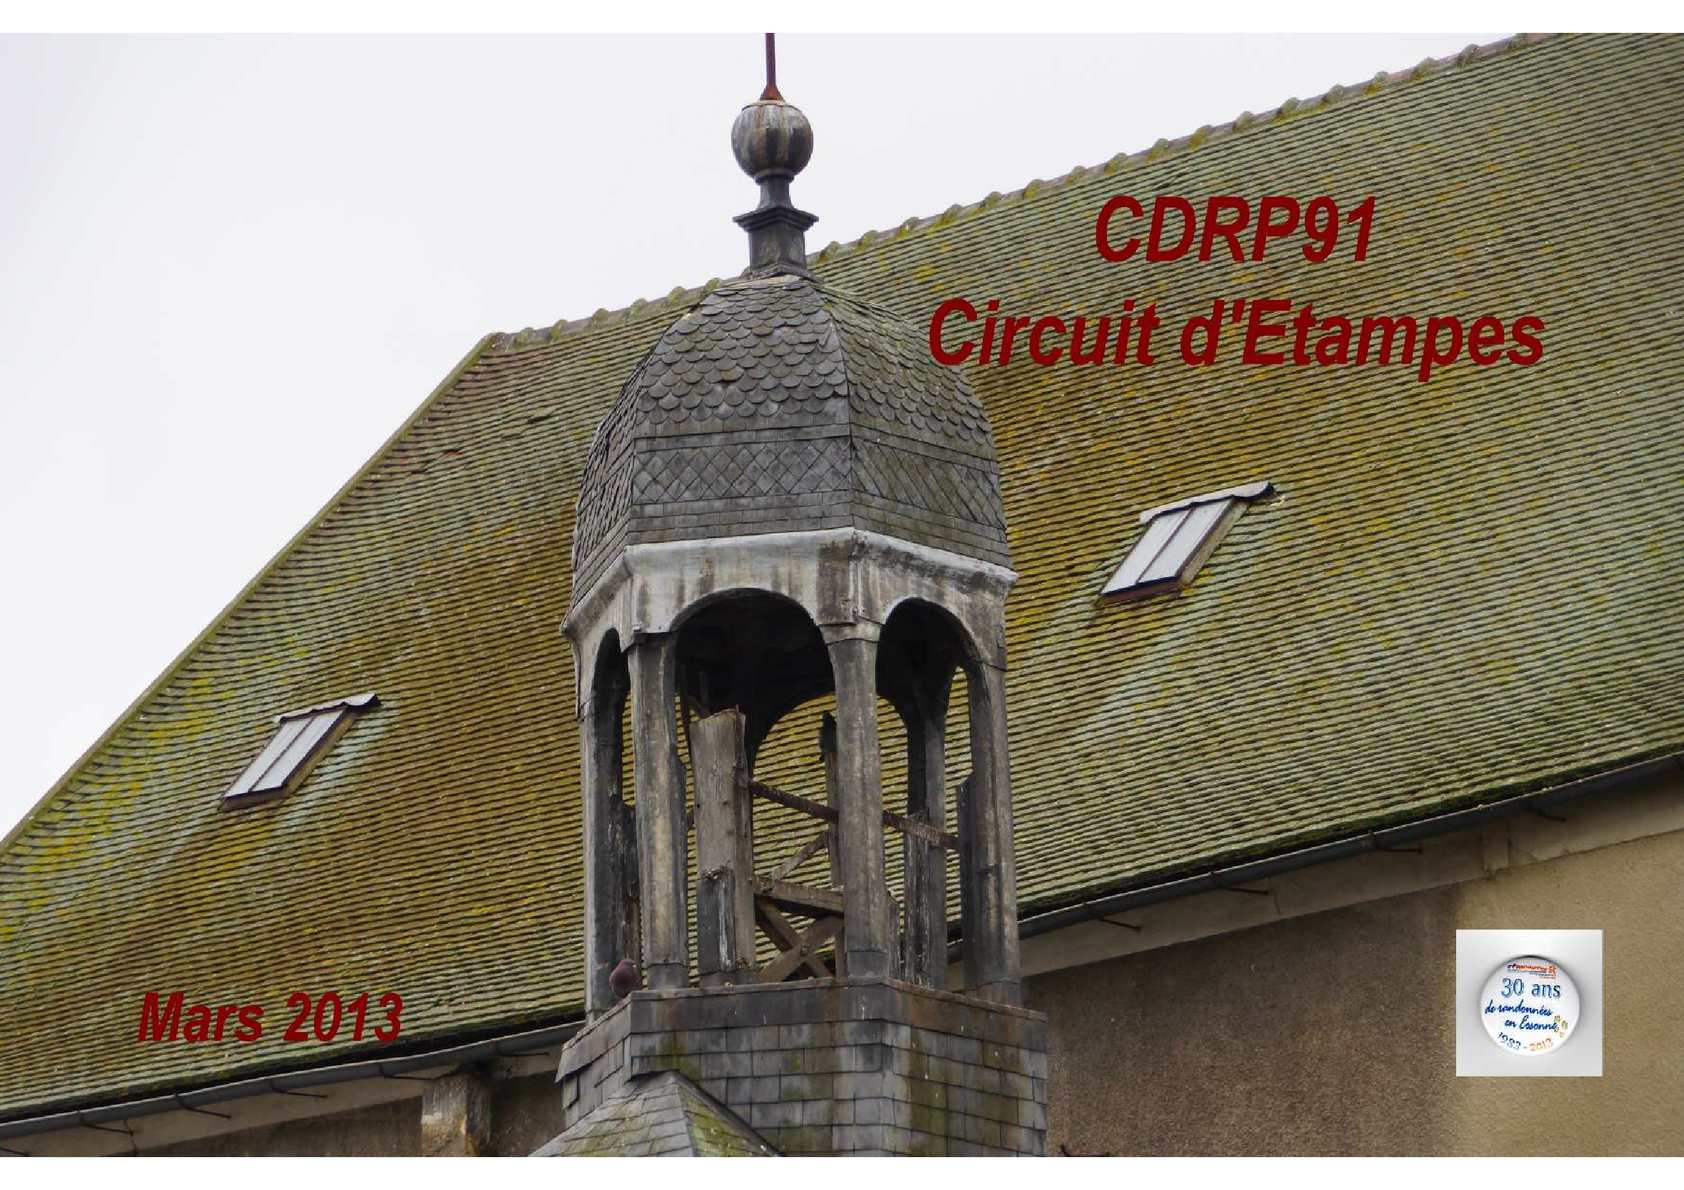 CDRP91 - Circuit d'Etampes